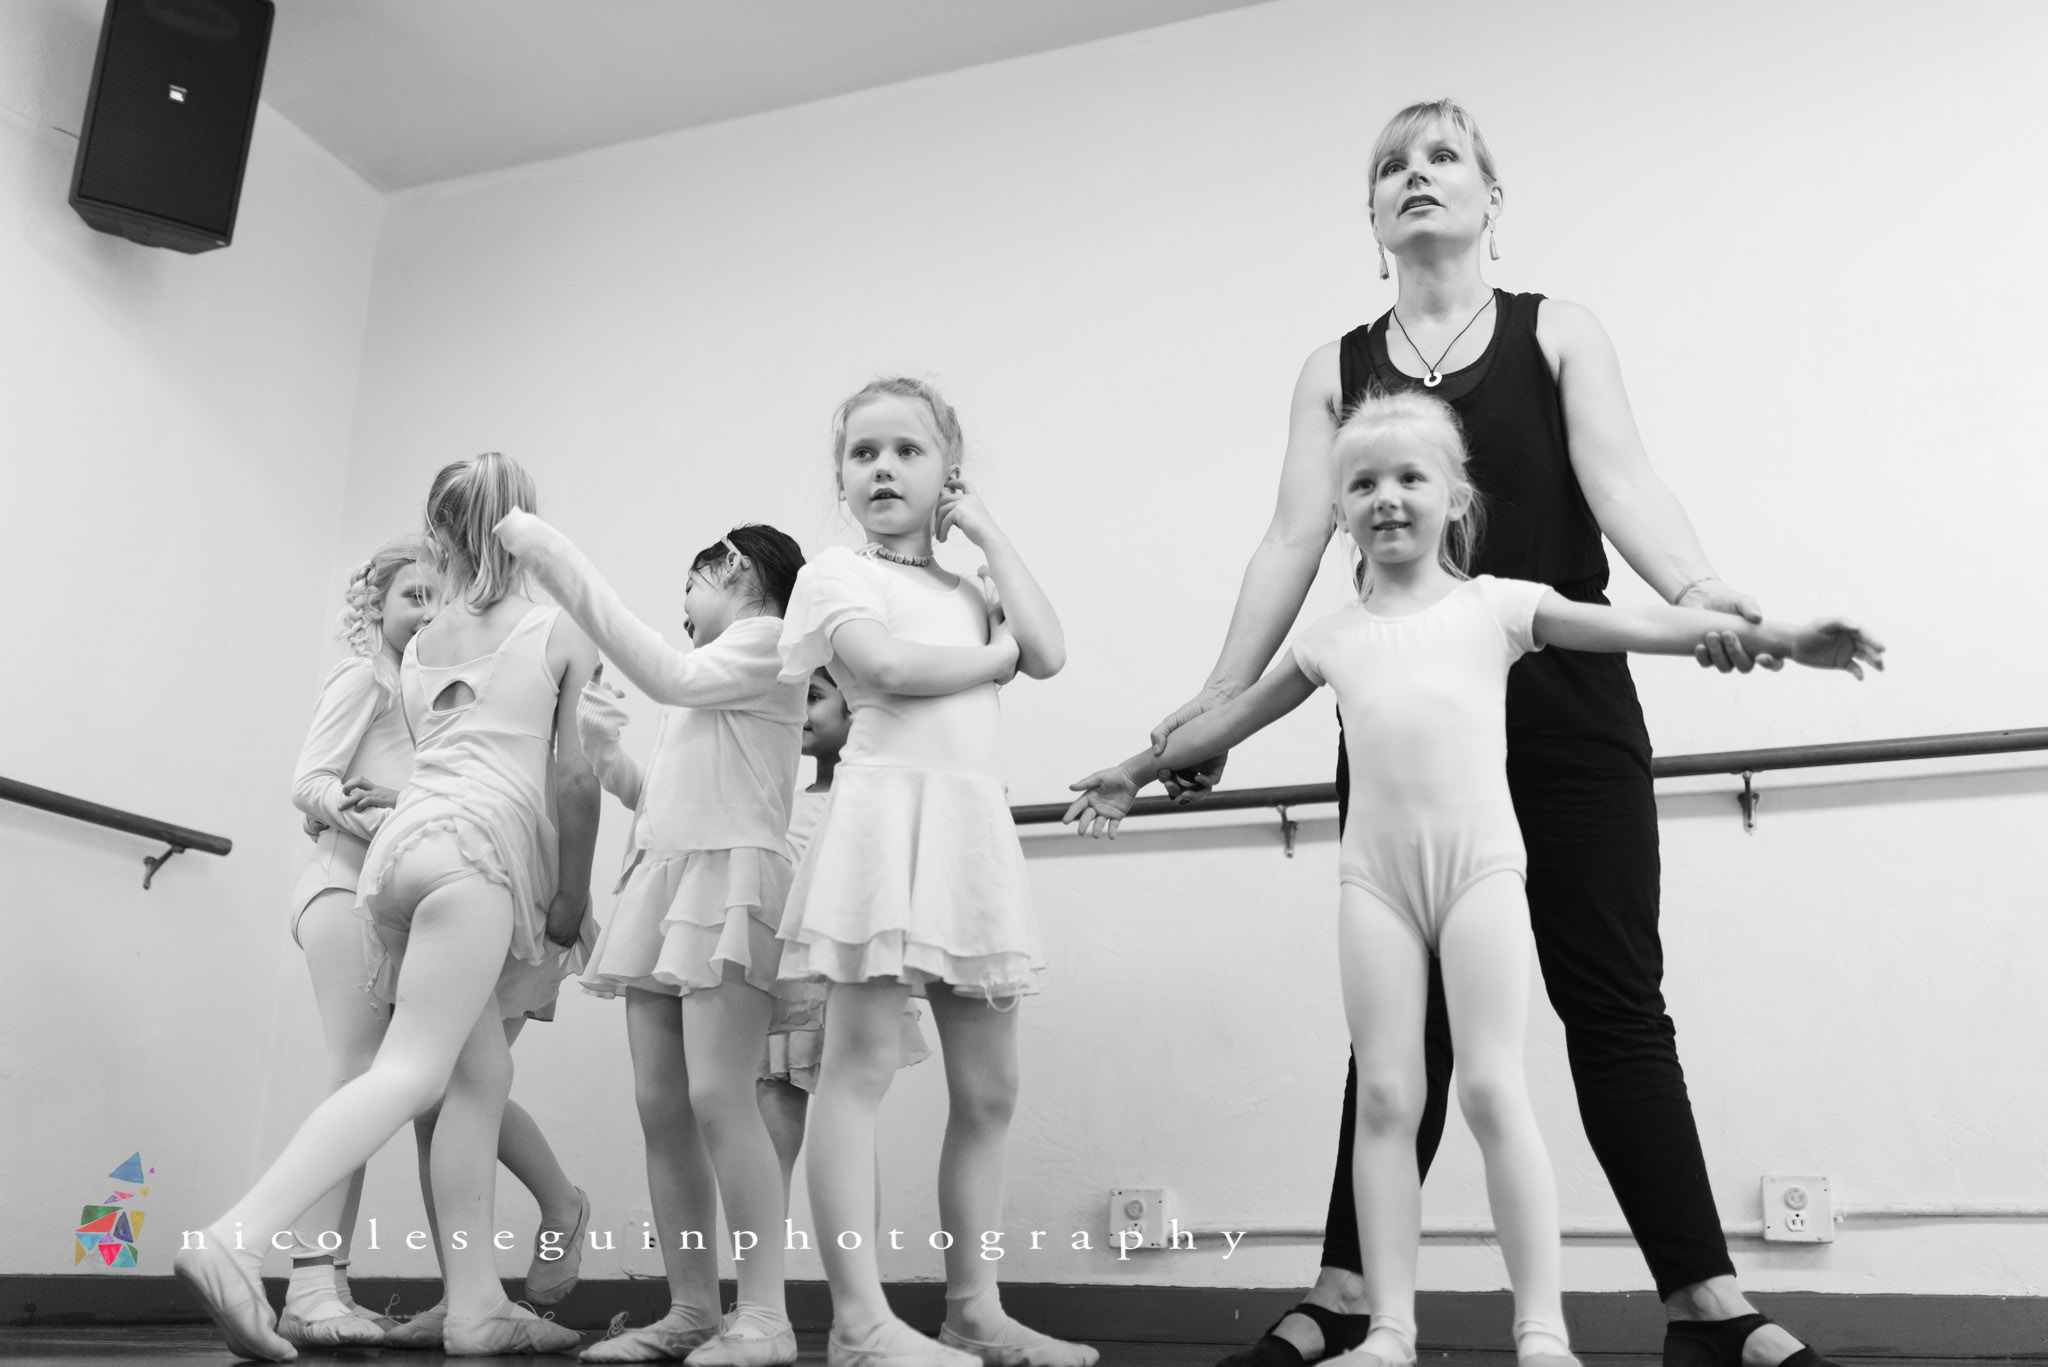 nicoseguinphotography ballet photoshoot